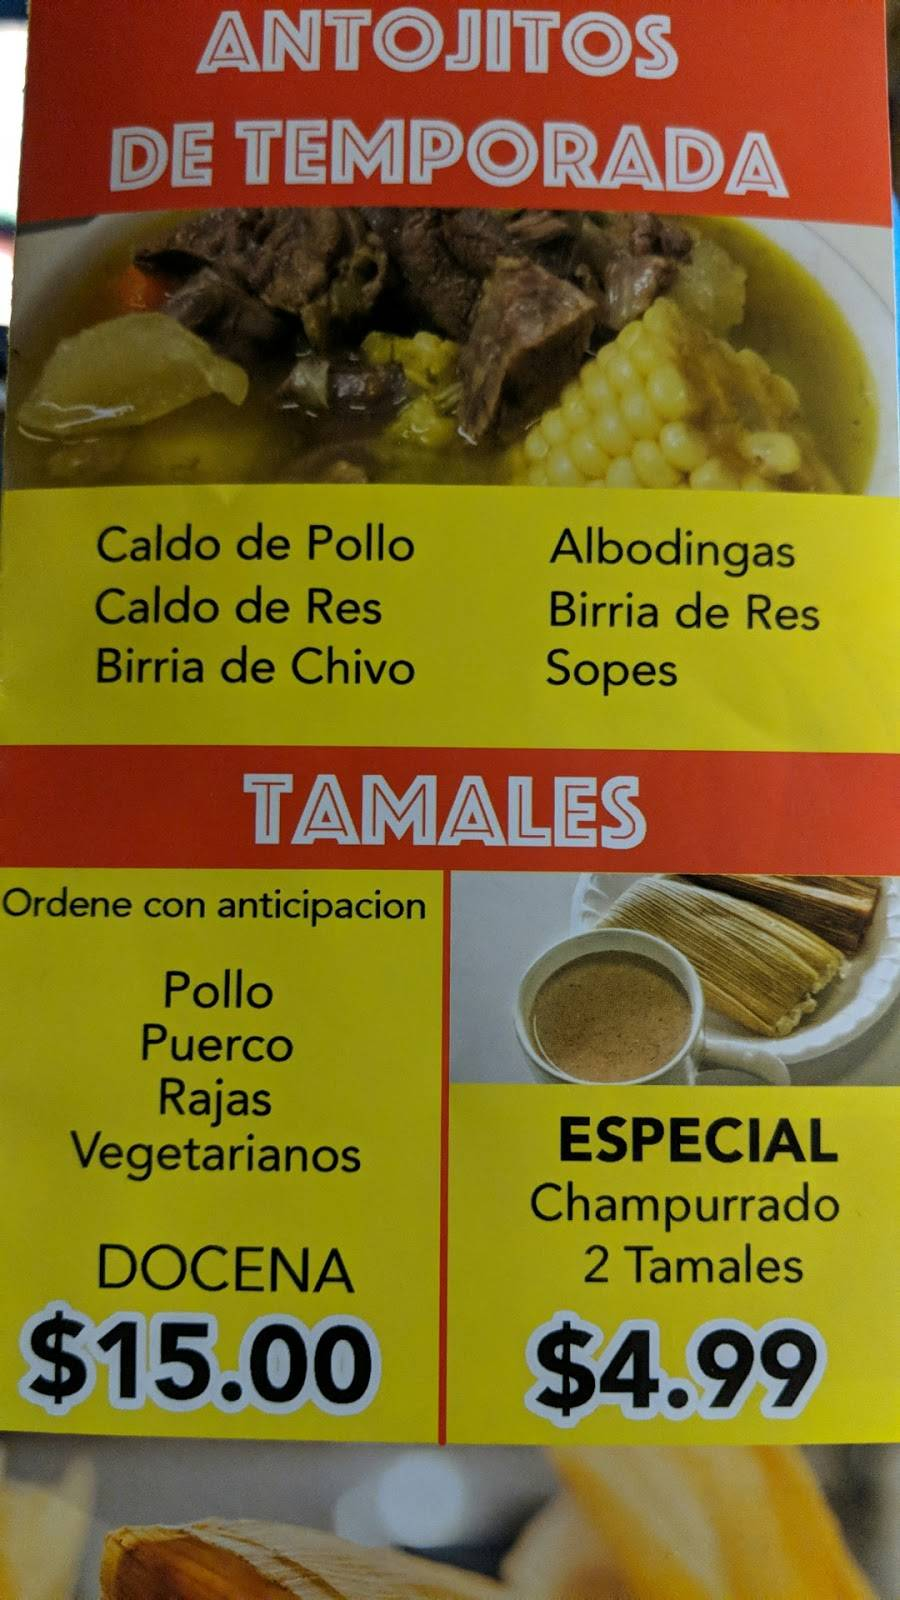 Supertacos | restaurant | 553 S Newmark Ave, Parlier, CA 93648, USA | 5596462997 OR +1 559-646-2997